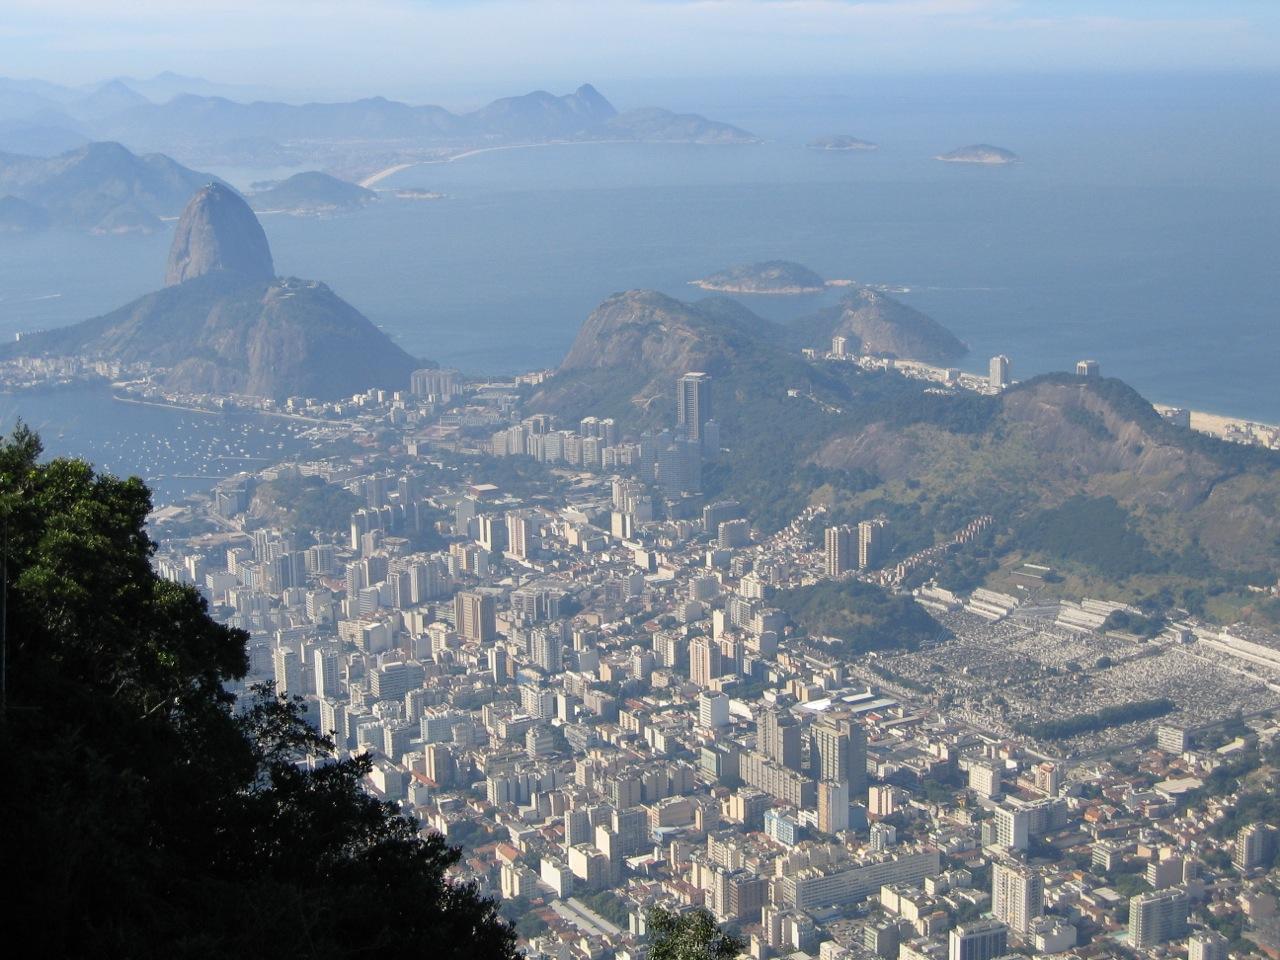 View of Rio de Janeiro from Corcovado. The Jardim Botanico lies at the base of this mountain.